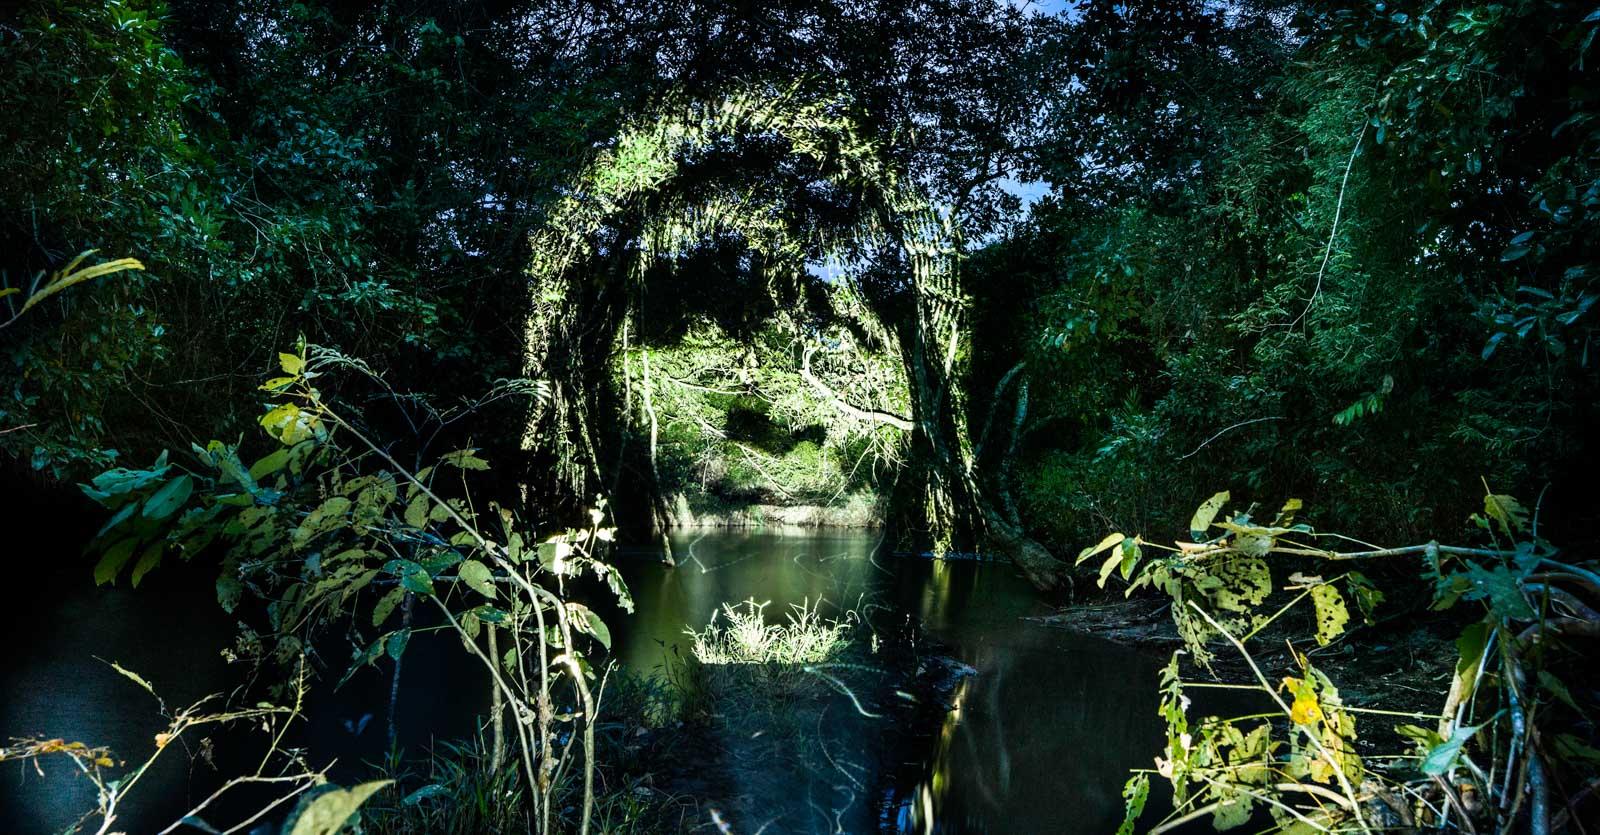 Los rostros de la selva - Philippe Echaroux